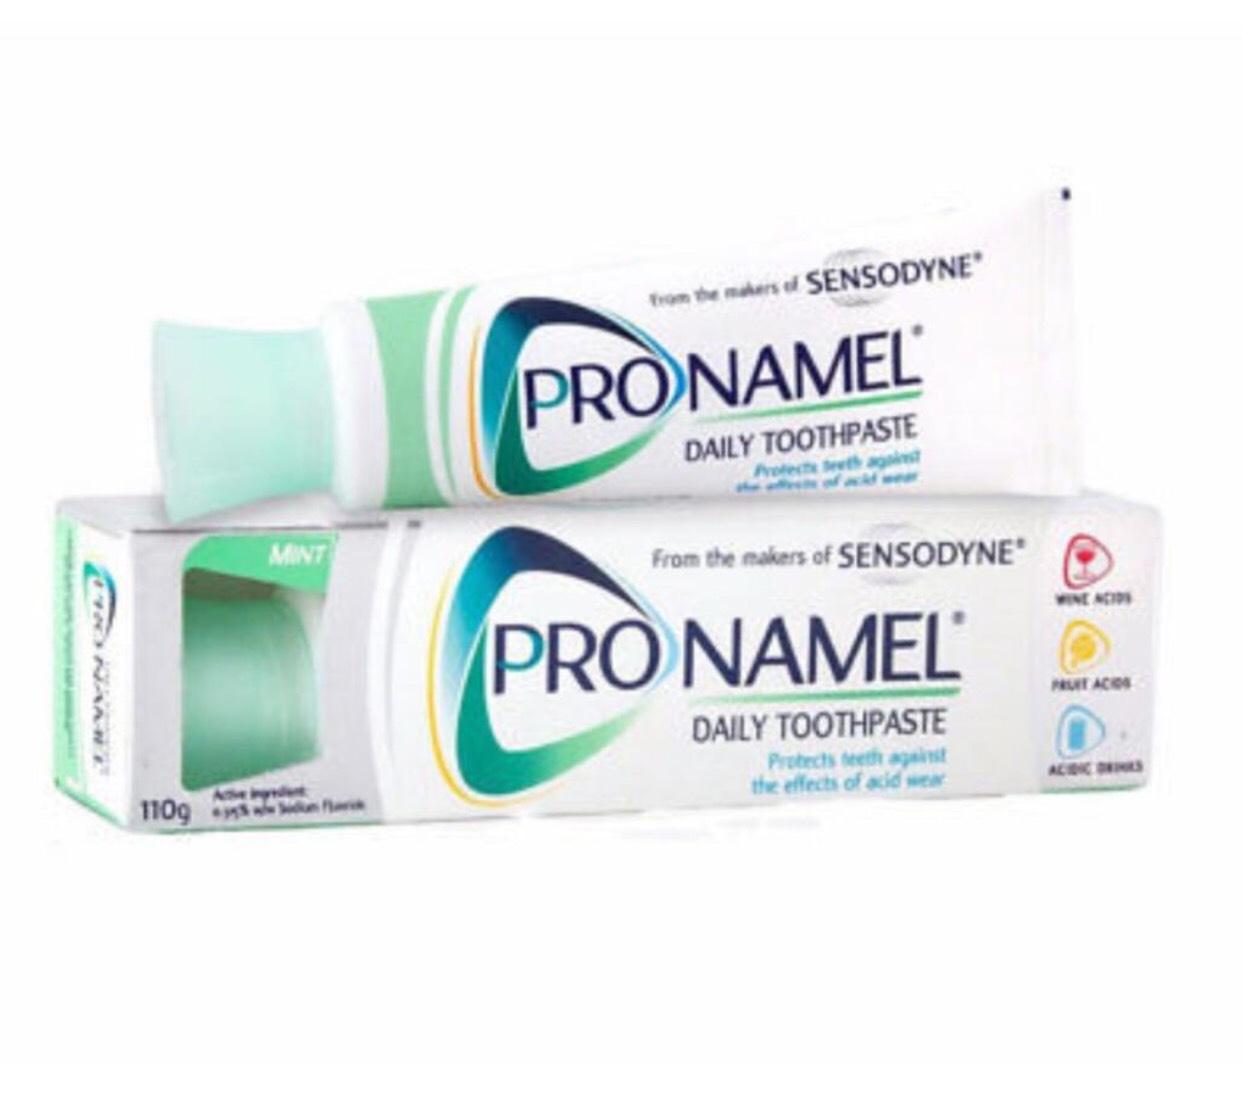 All Sensodyne Pronamel Range Now Half Price £2 at Sainsbury's